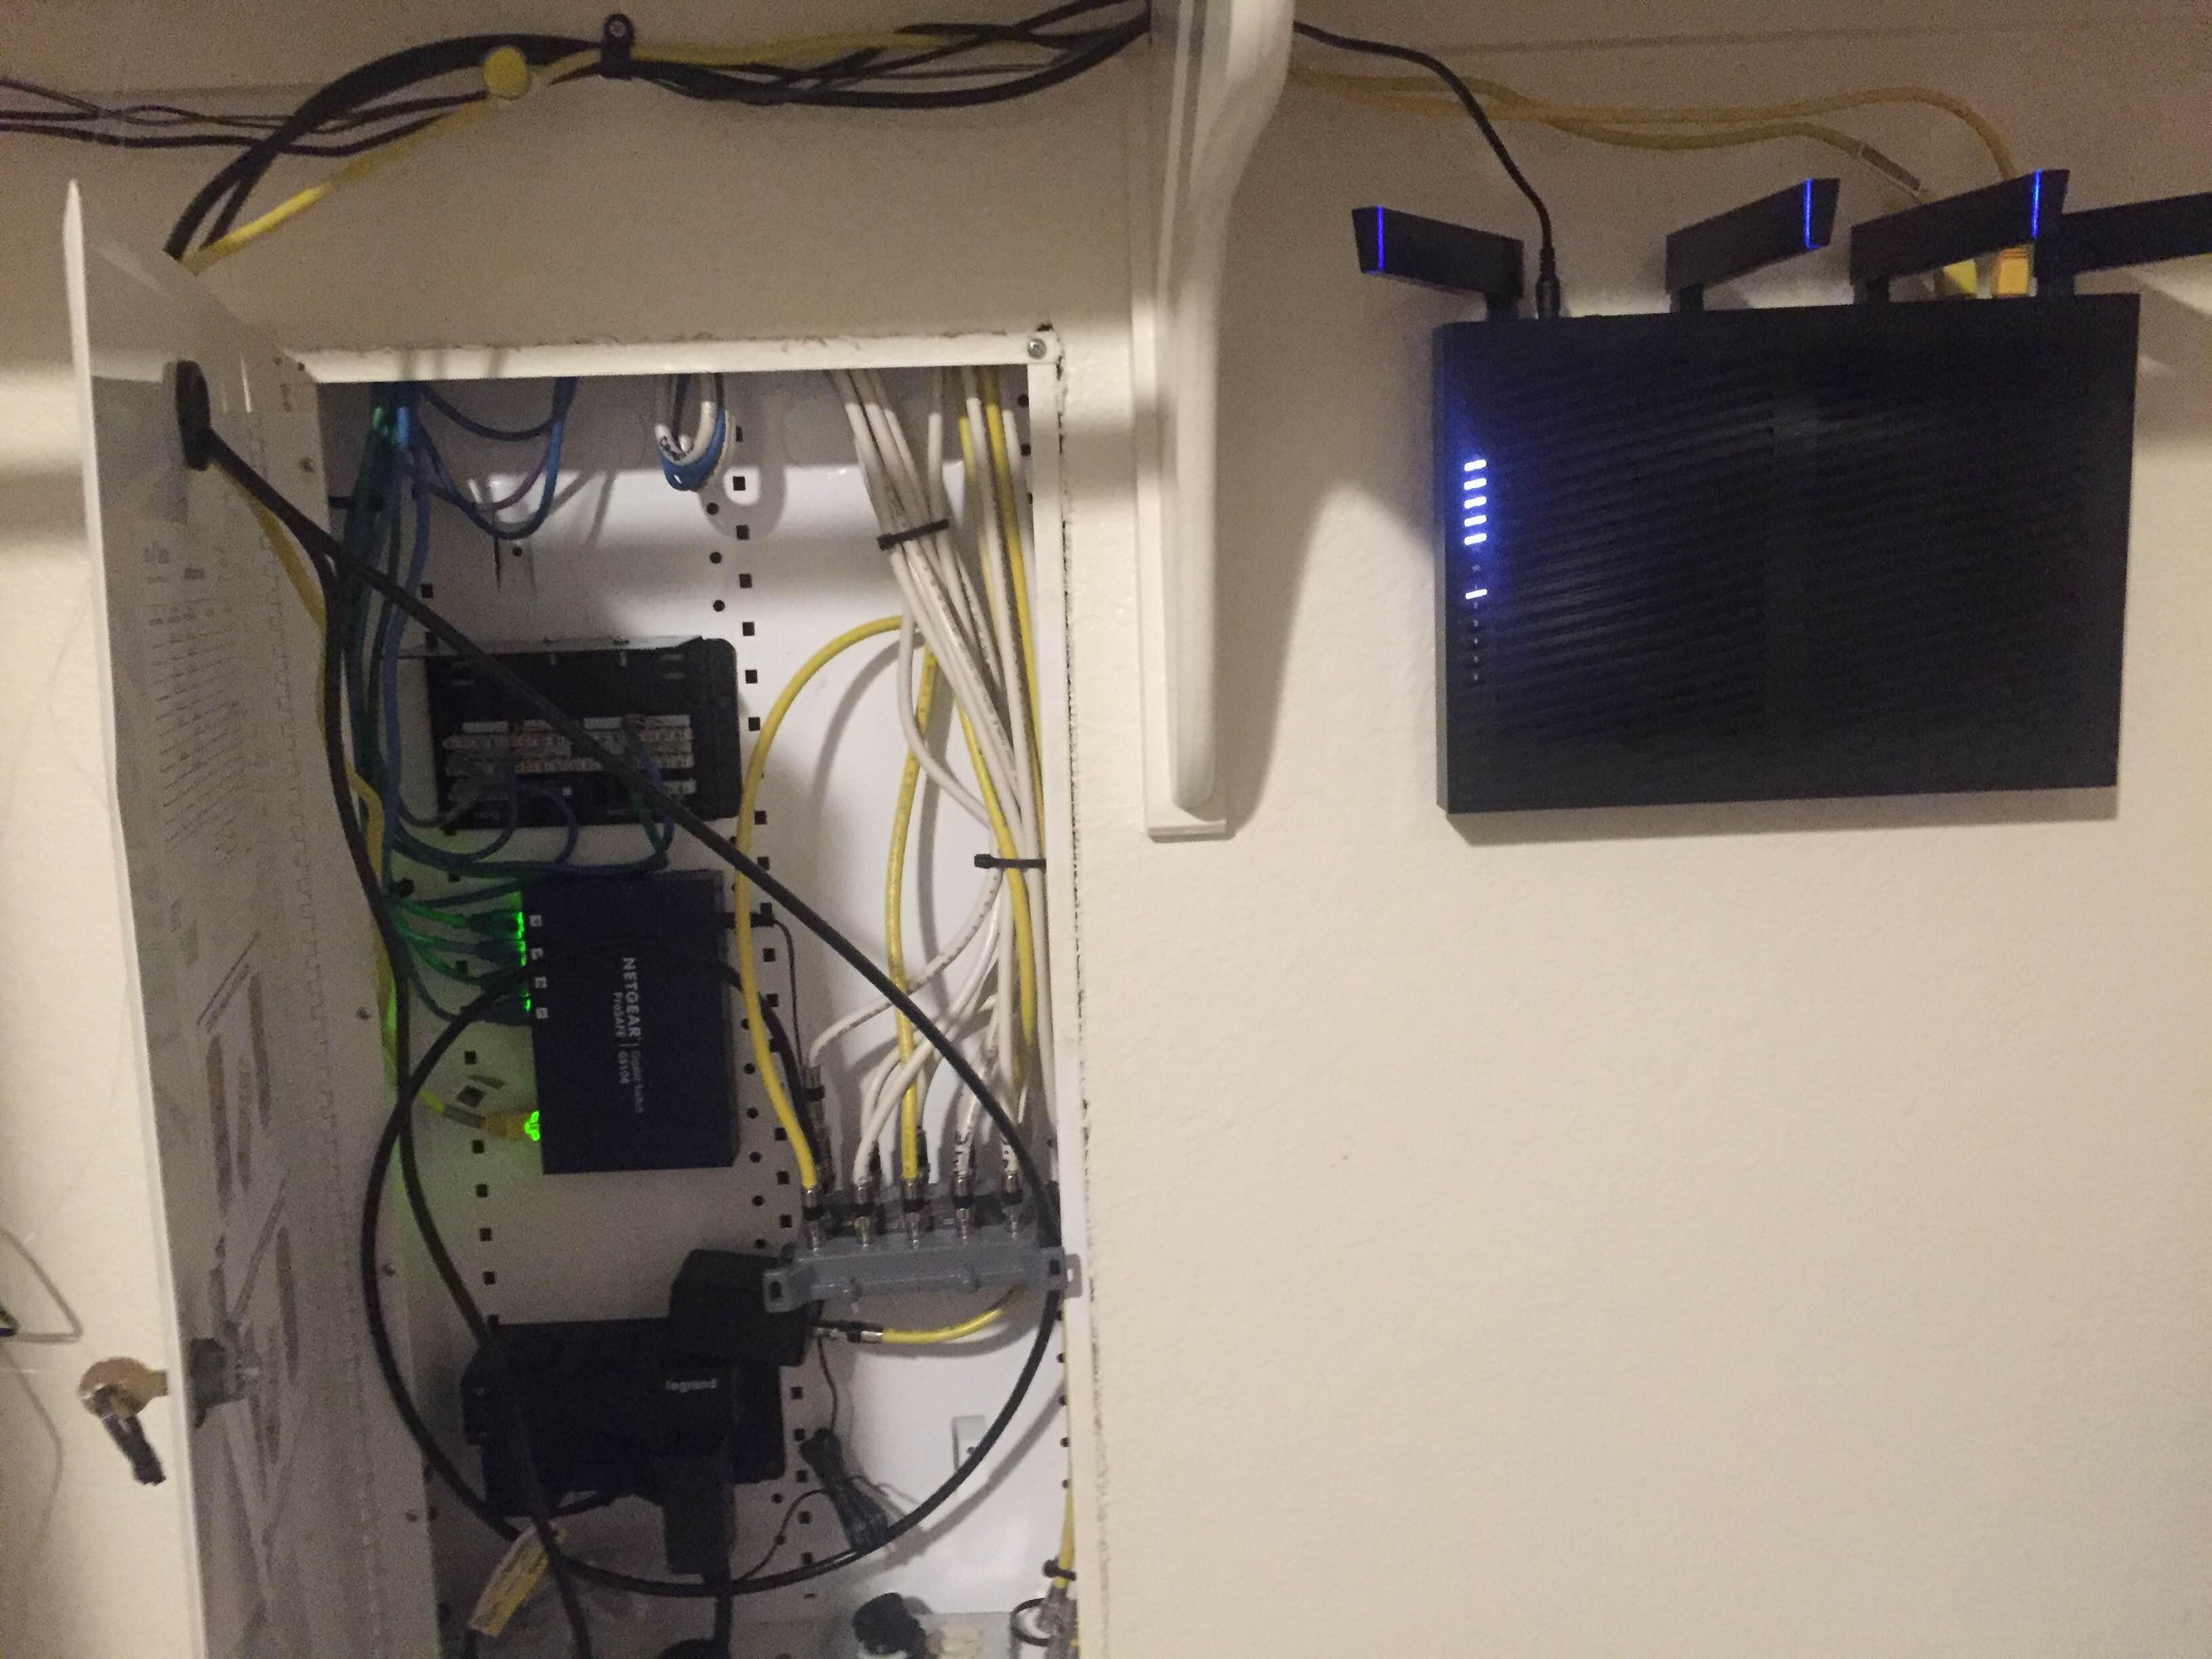 hight resolution of onq panel r8500 img 3263